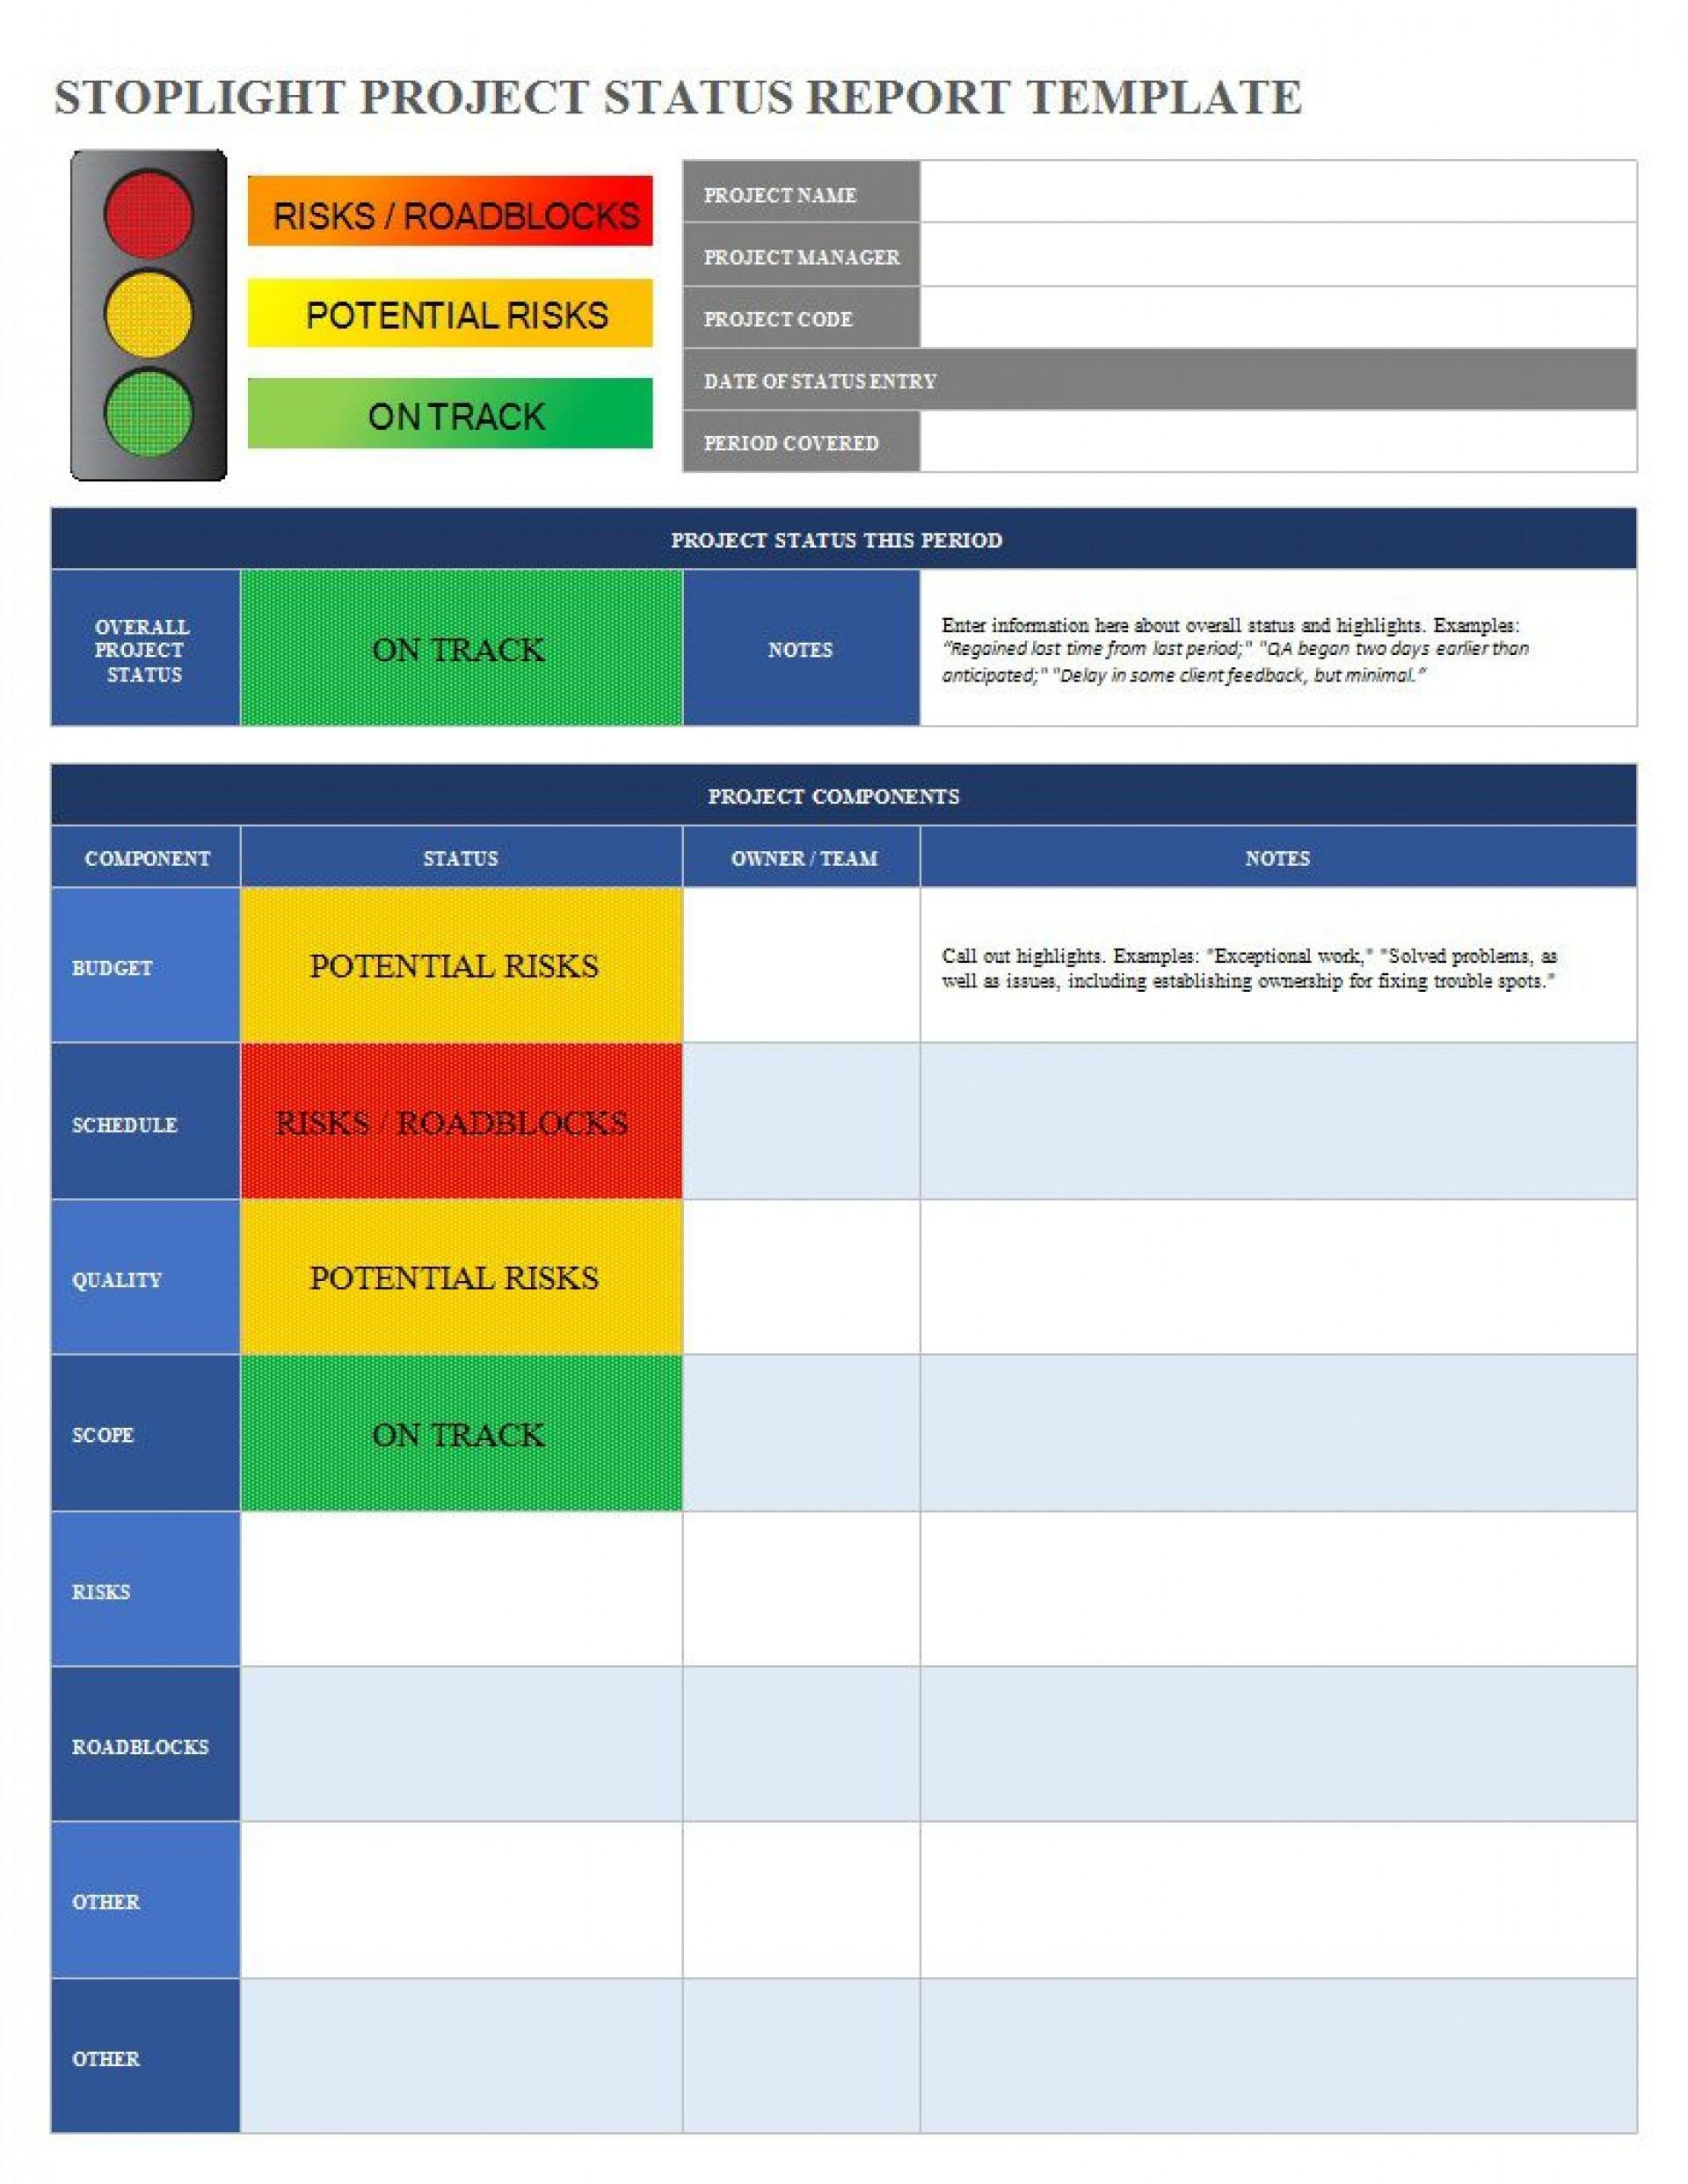 001 Excellent Project Statu Report Template Excel Inspiration  Free Progres Format Xl1920